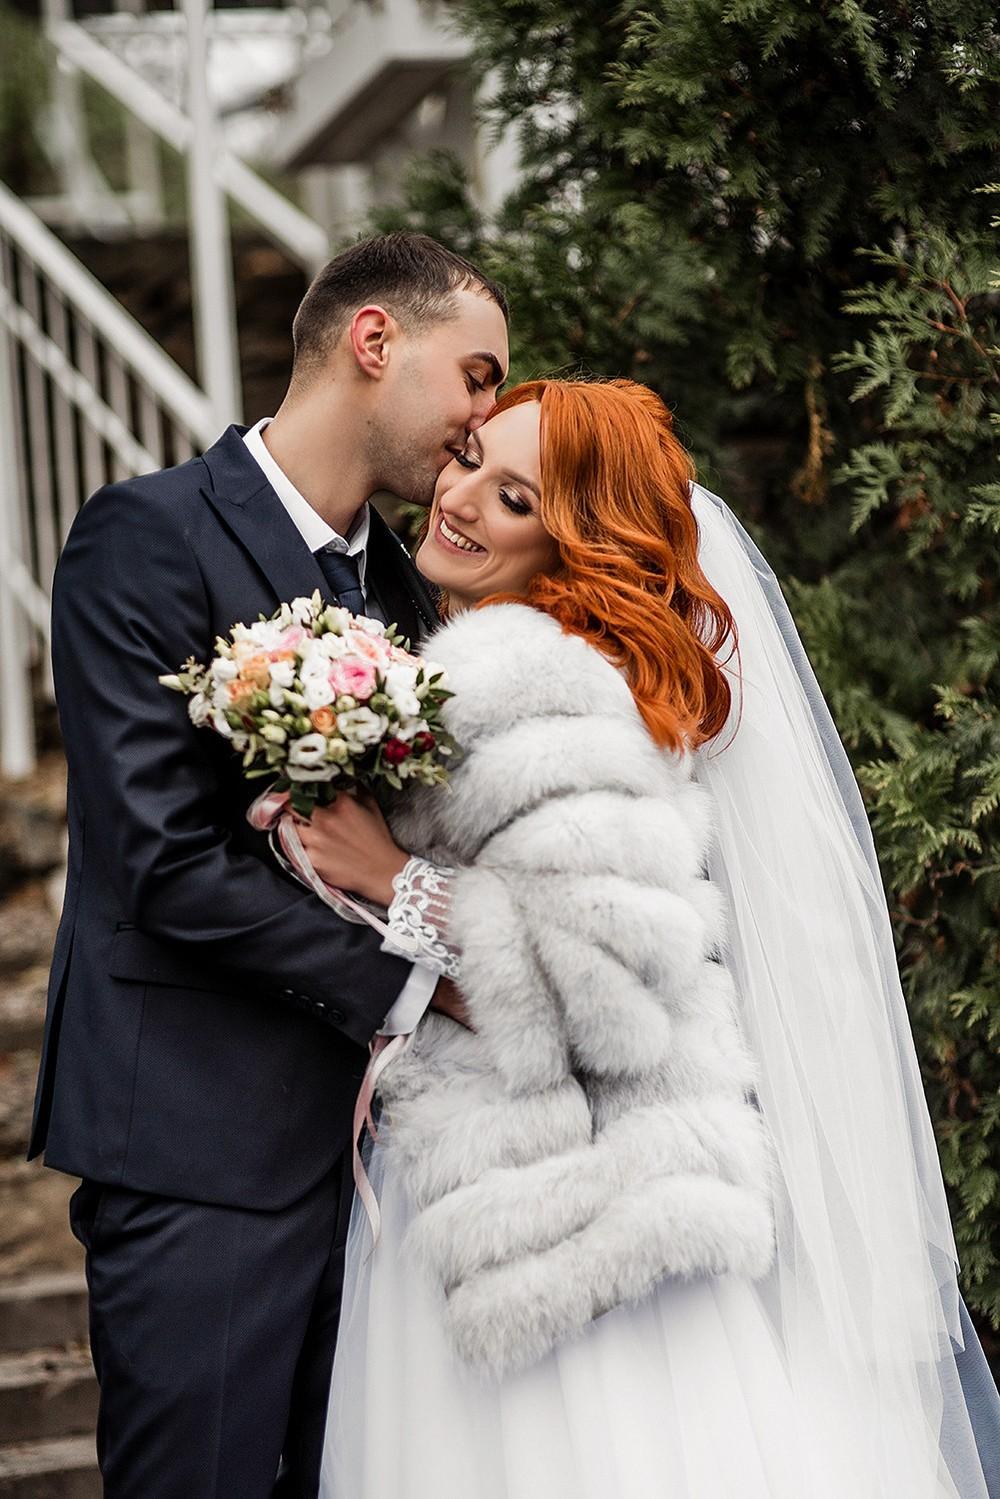 Свадебная фотосъемка и лав стори - 21 ноября 2020